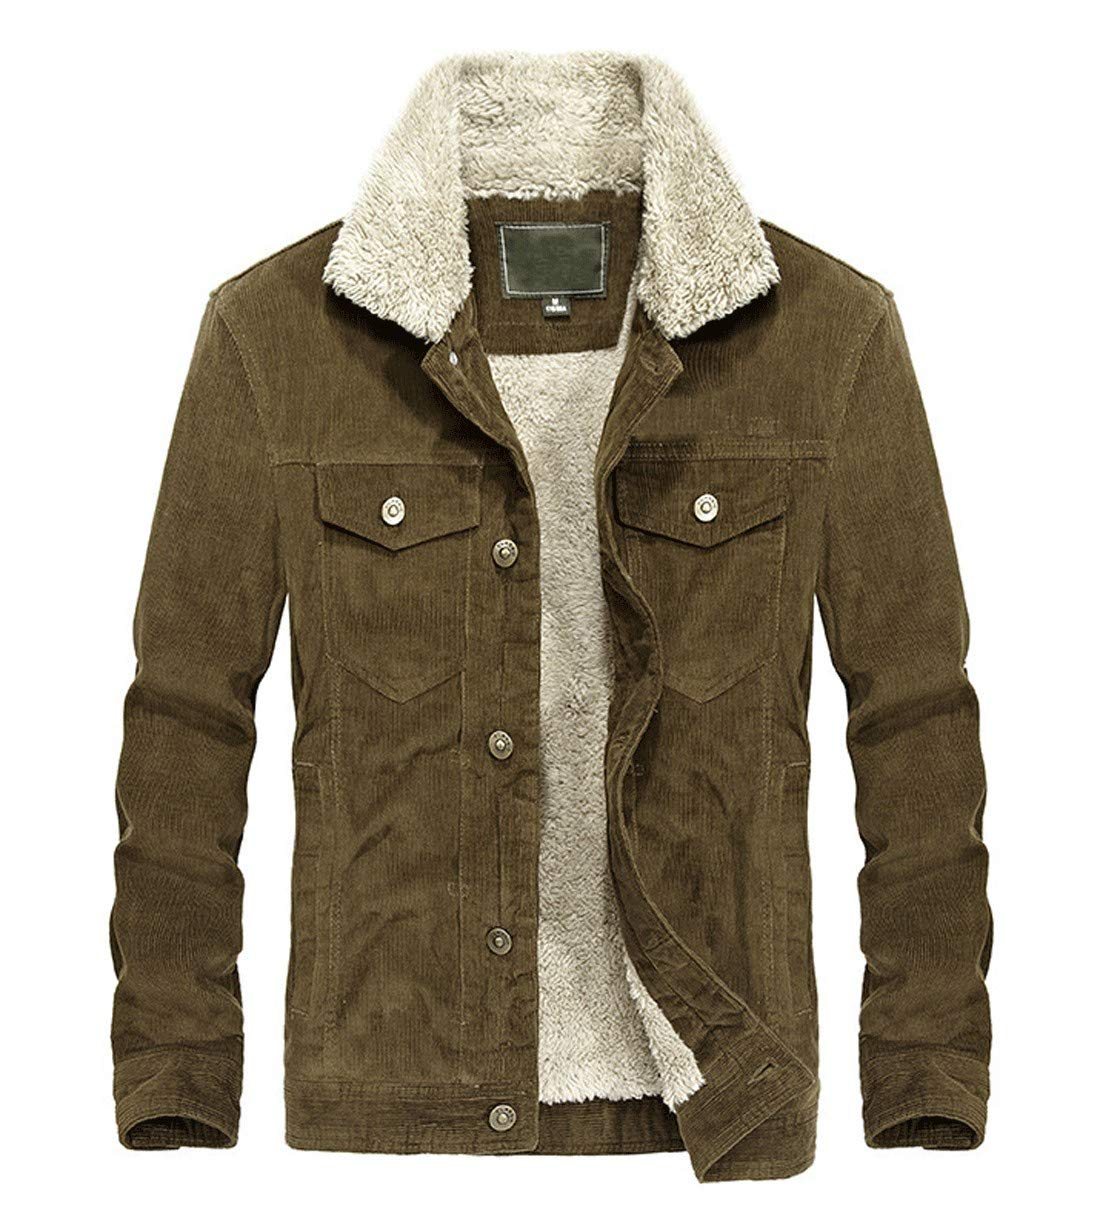 CHARTOU Men's Vintage Button-Front Sherpa Lined Shearling Slim Fit Corduroy Denim Jacket (X-Large, Coffee-Fleece) by CHARTOU